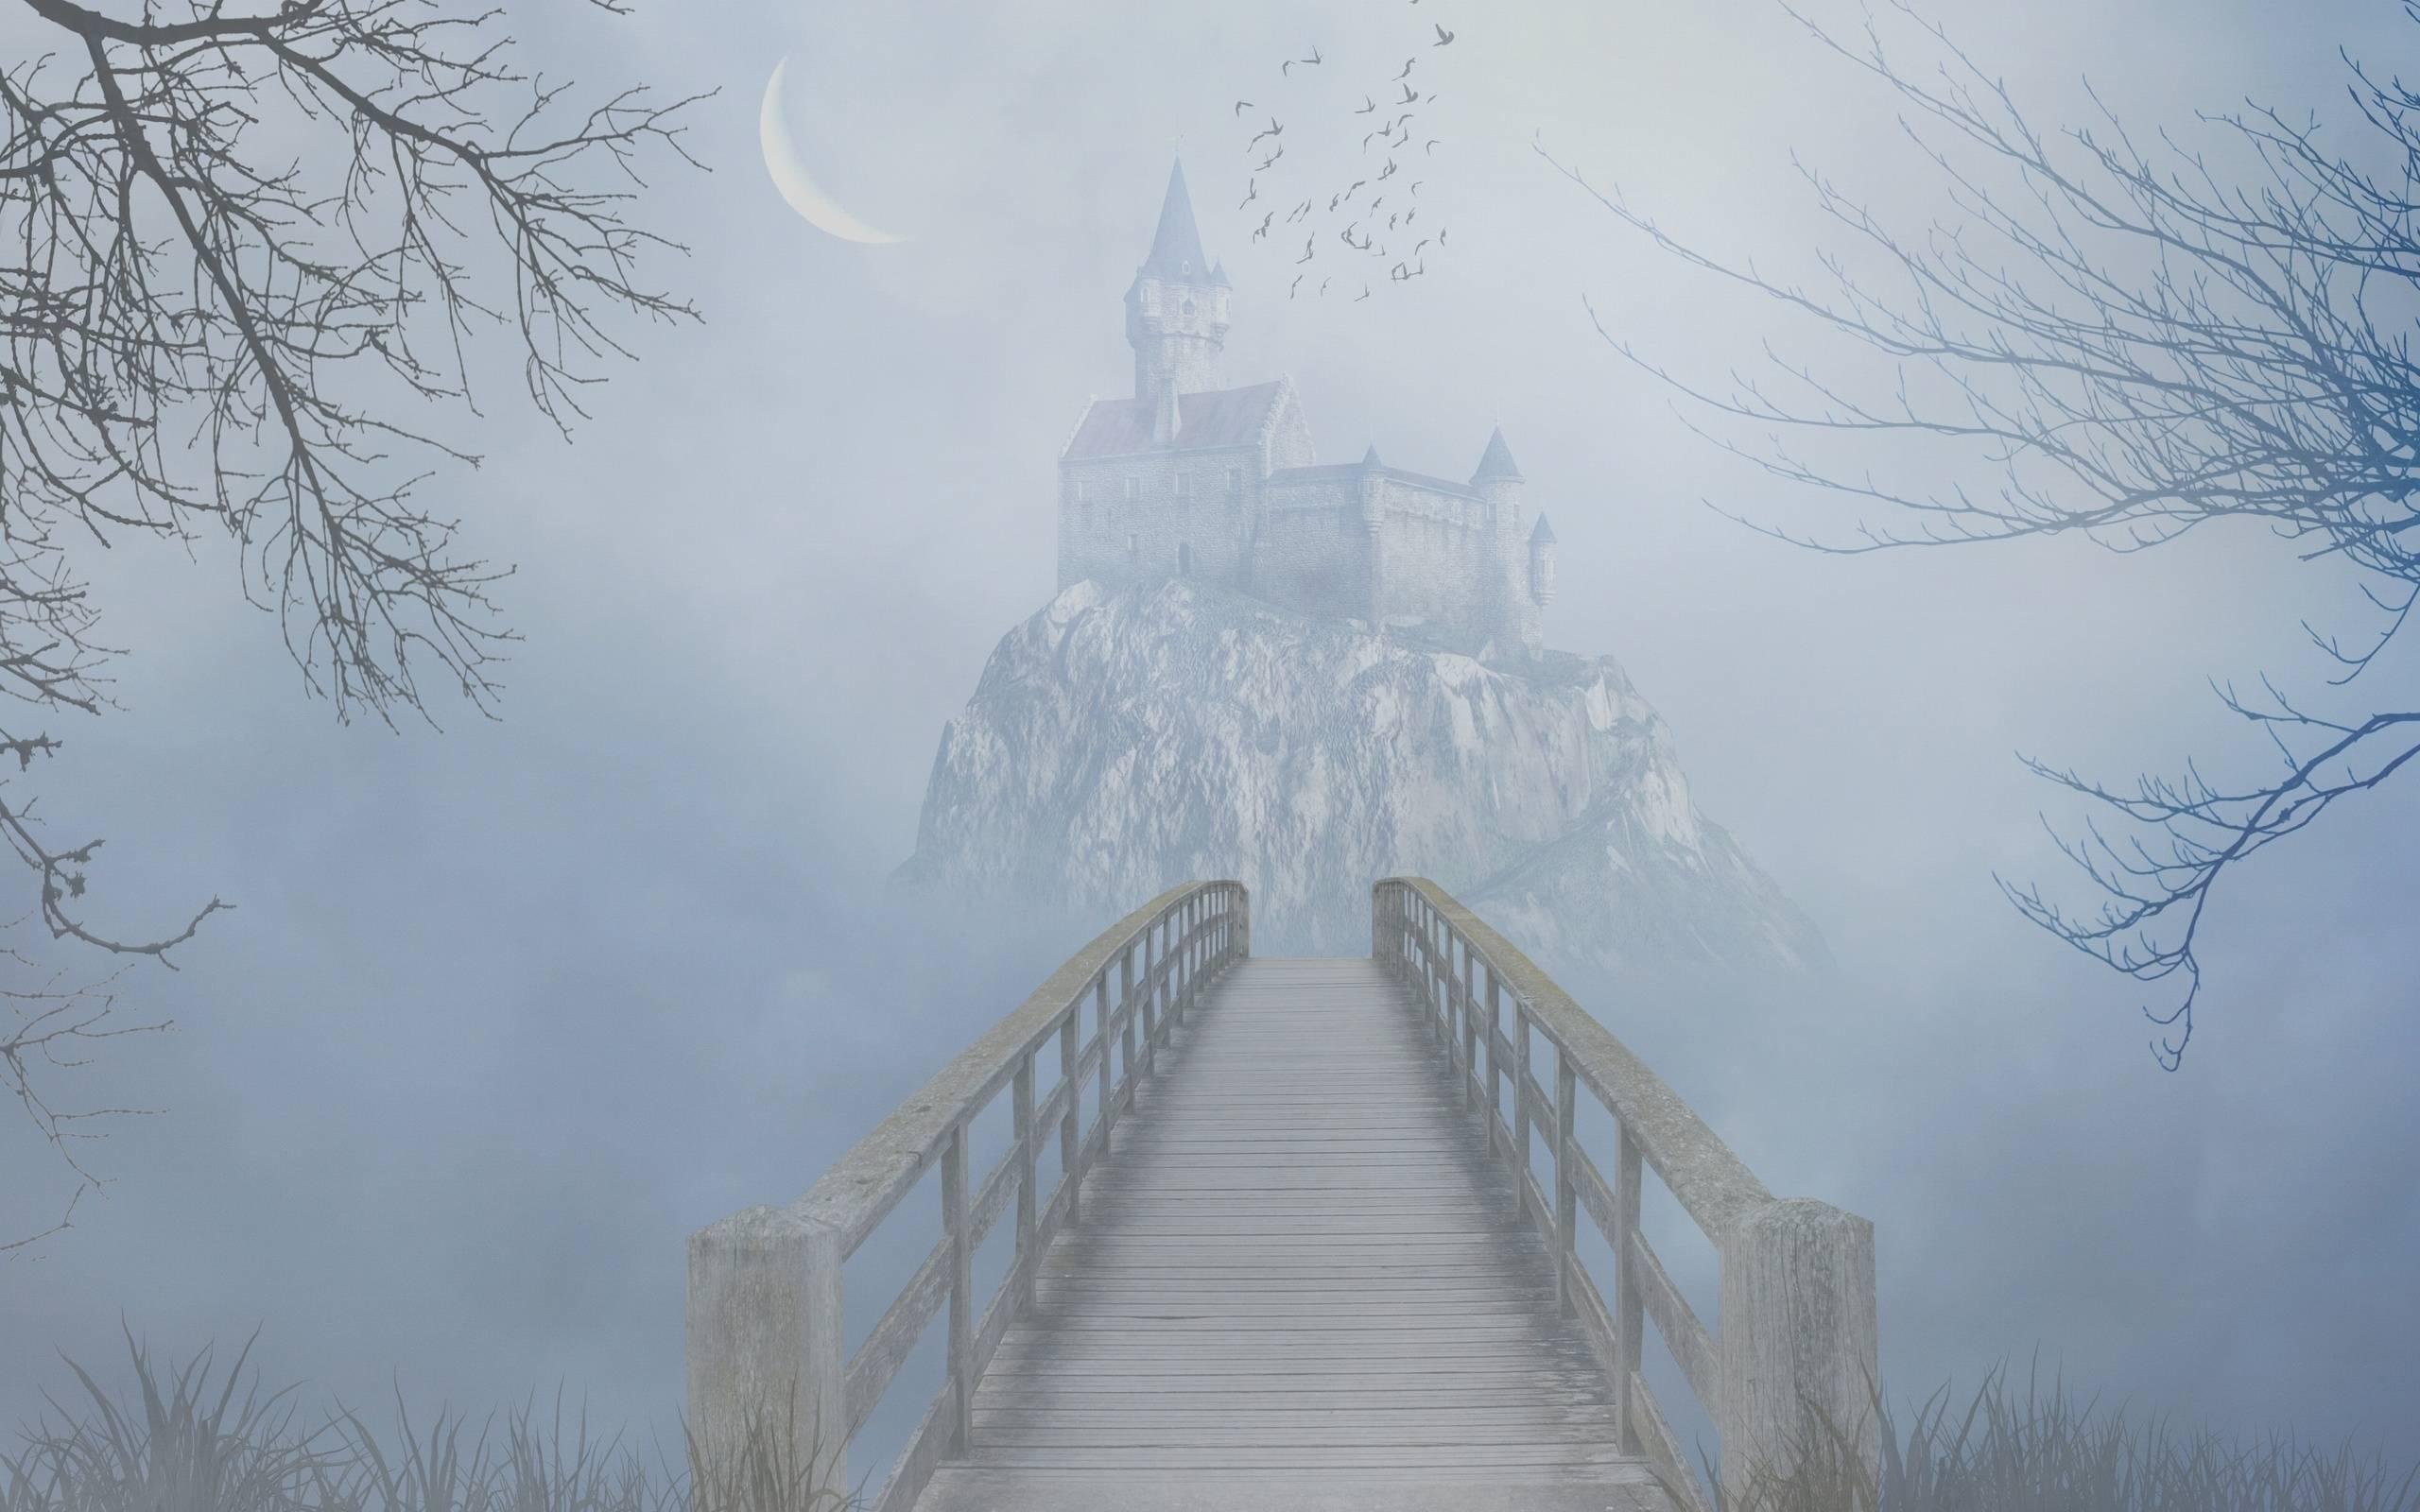 Обои мостик, путь к замку, туман, месяц